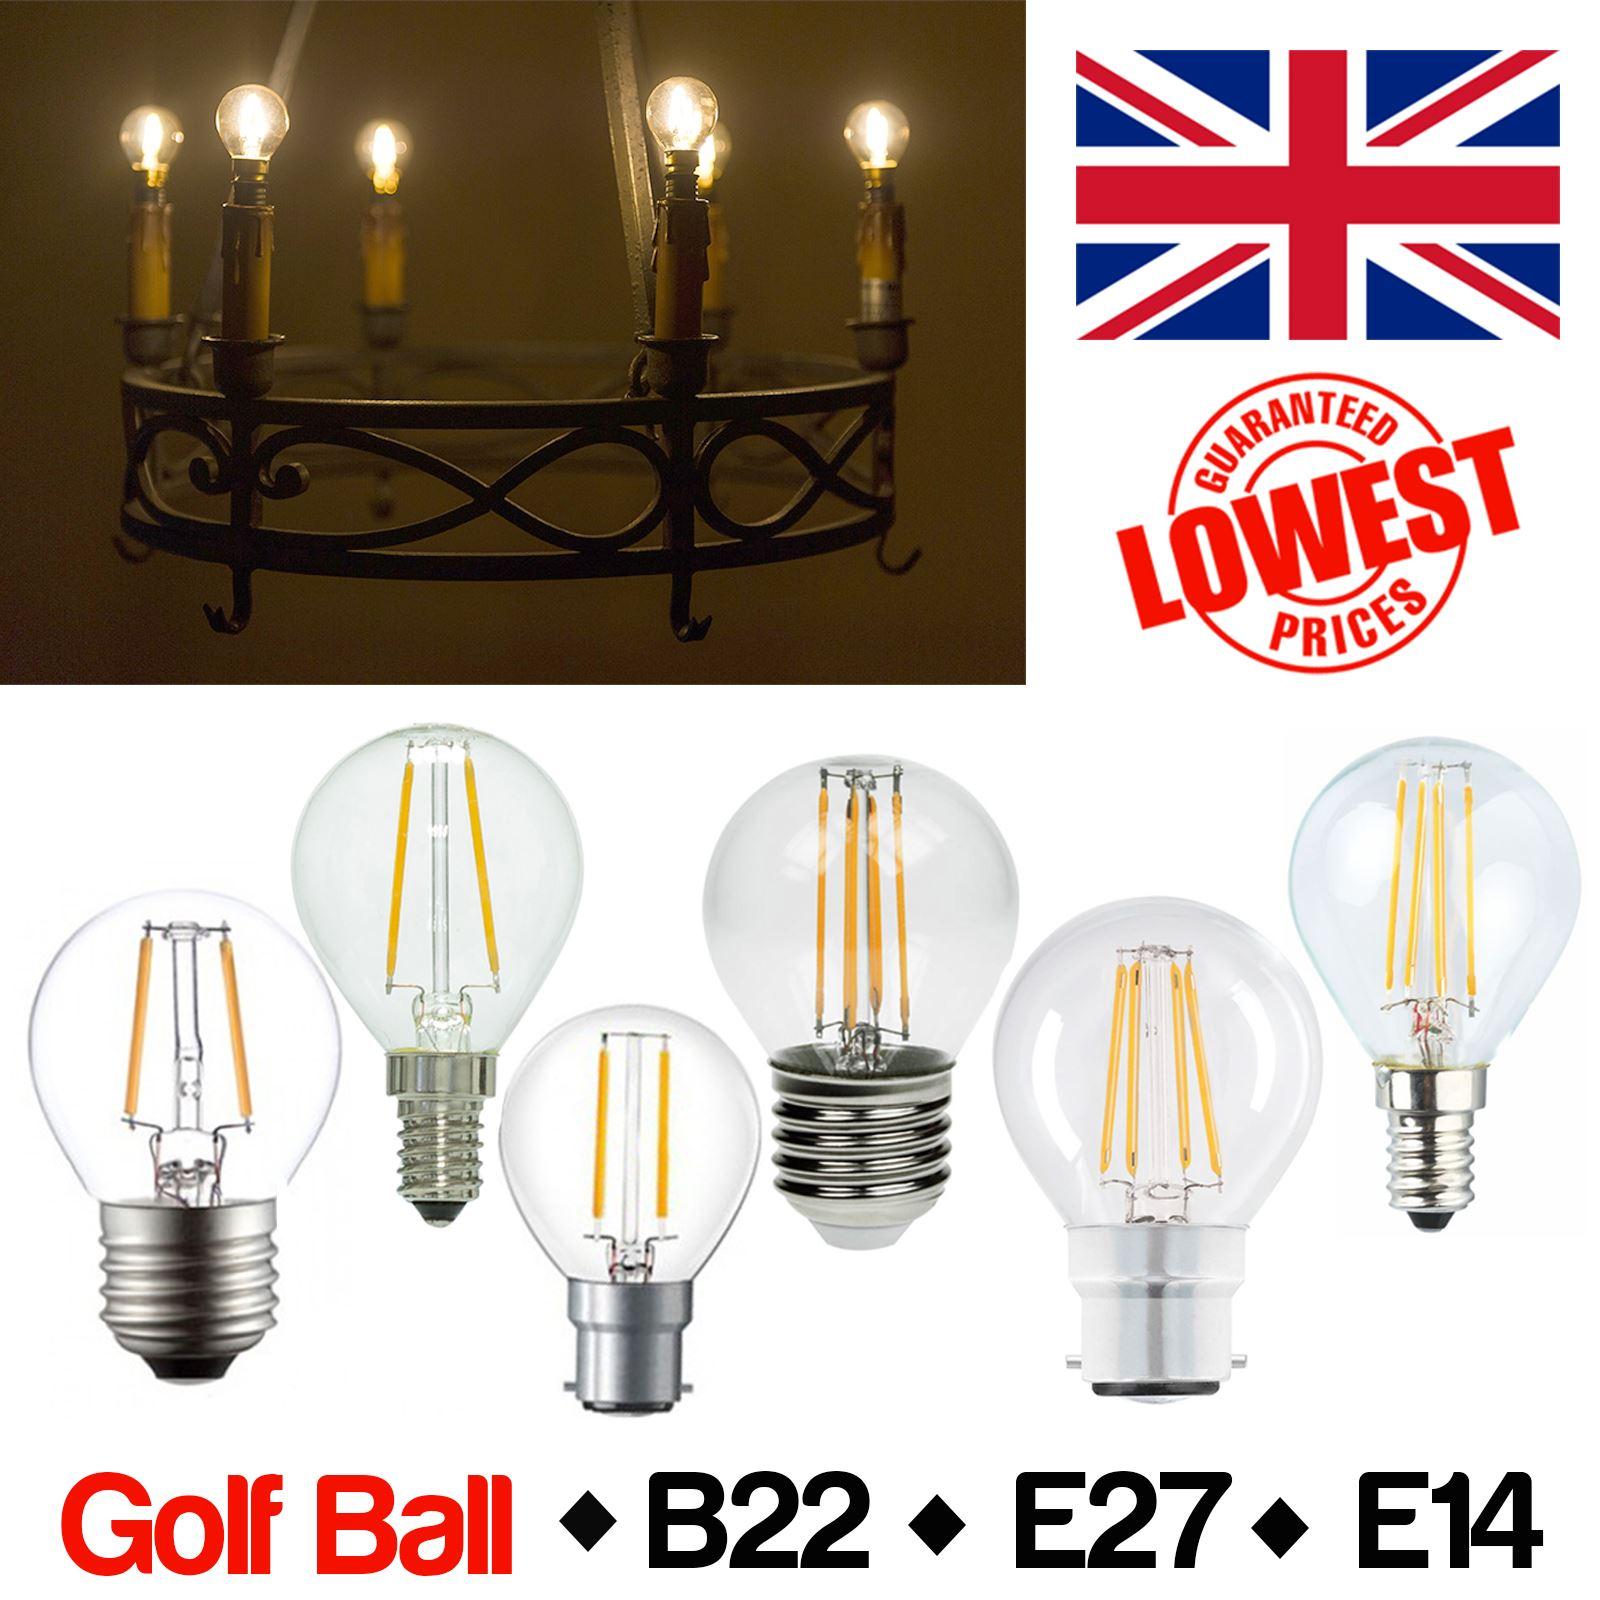 Affinity 4 2w 40w Filament Led Gls Es E27 Clear Light: LED Round Clear Filament Light Bulb 2W=25W 4W=40W BC B22